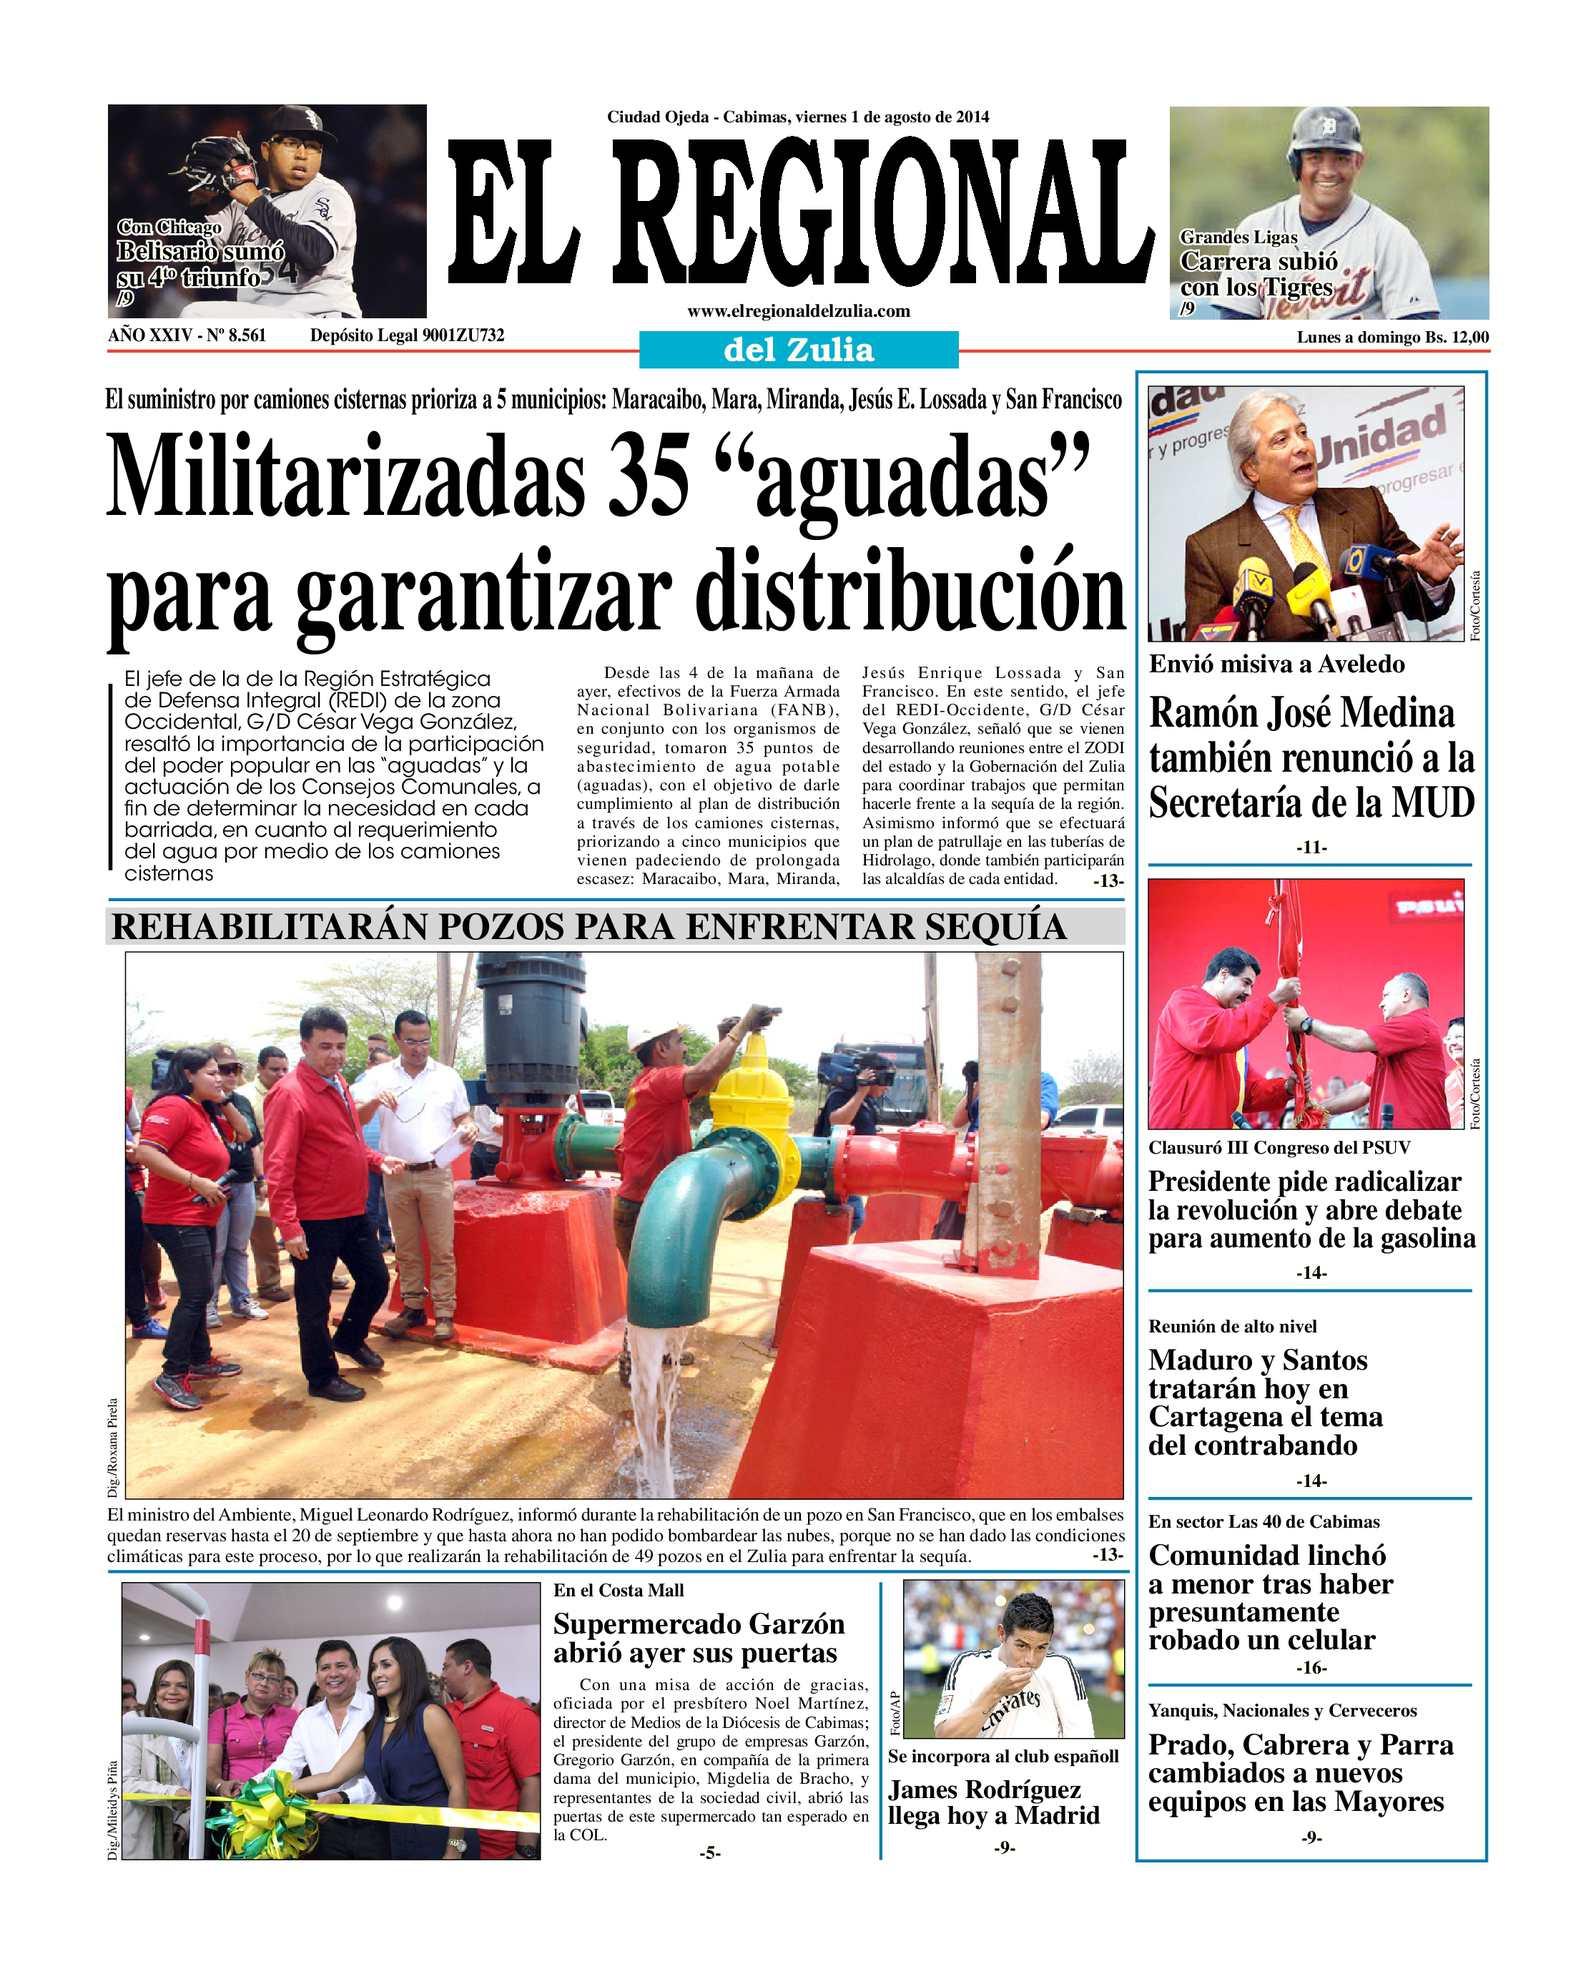 Calaméo - El Regional del Zulia 01-08-2014